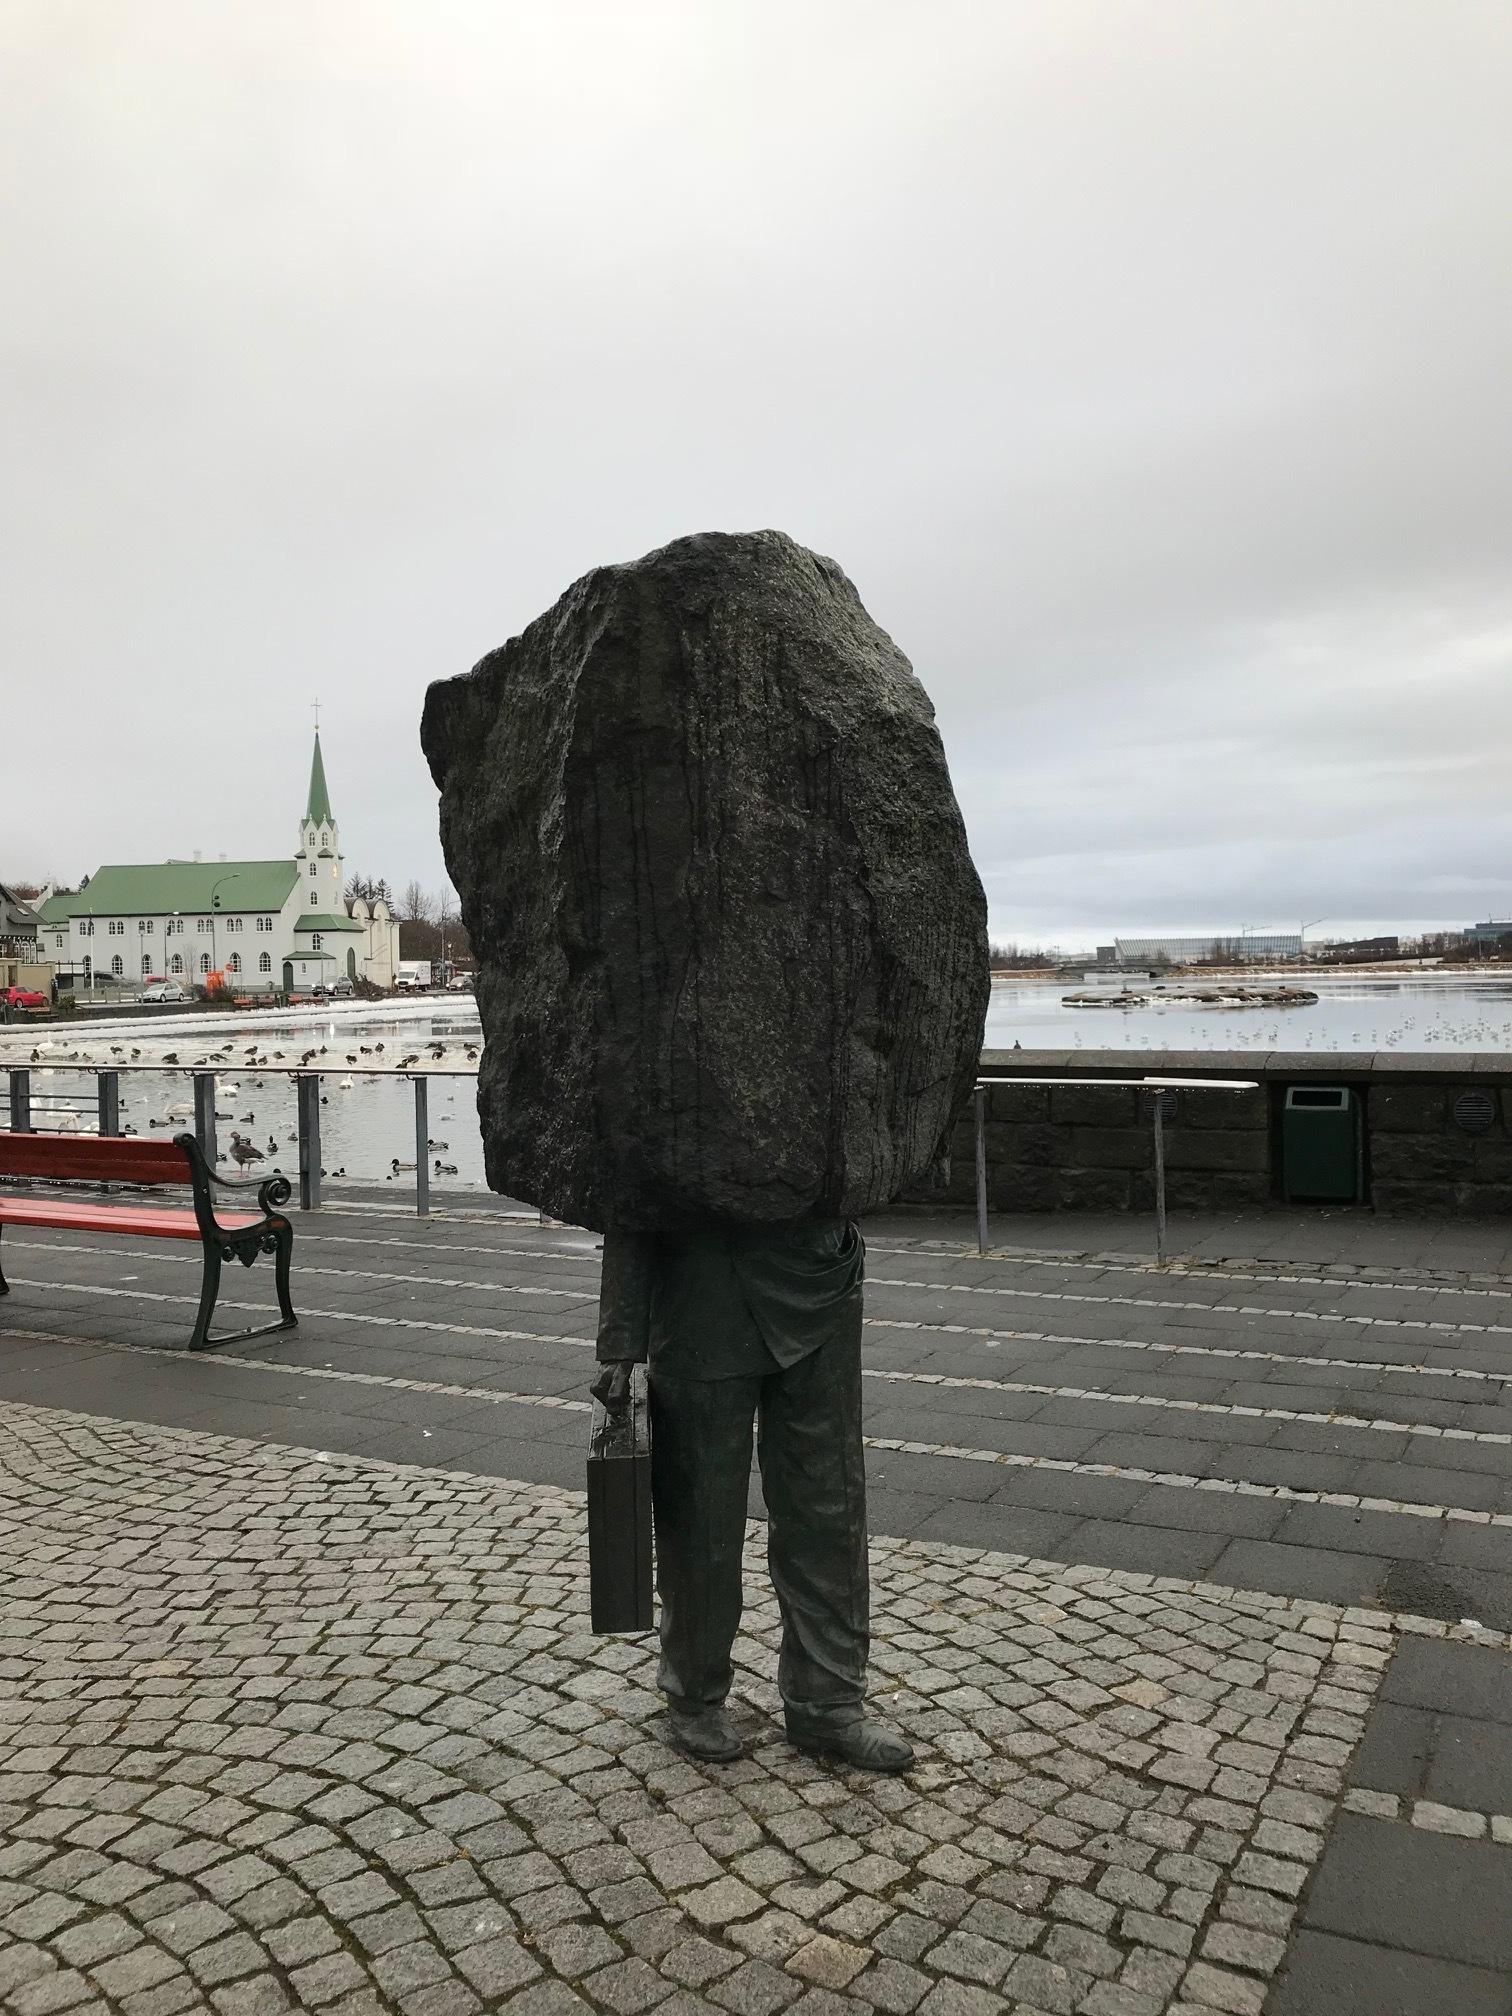 The Unknown Bureaucrat statue found near Tjornin Pond